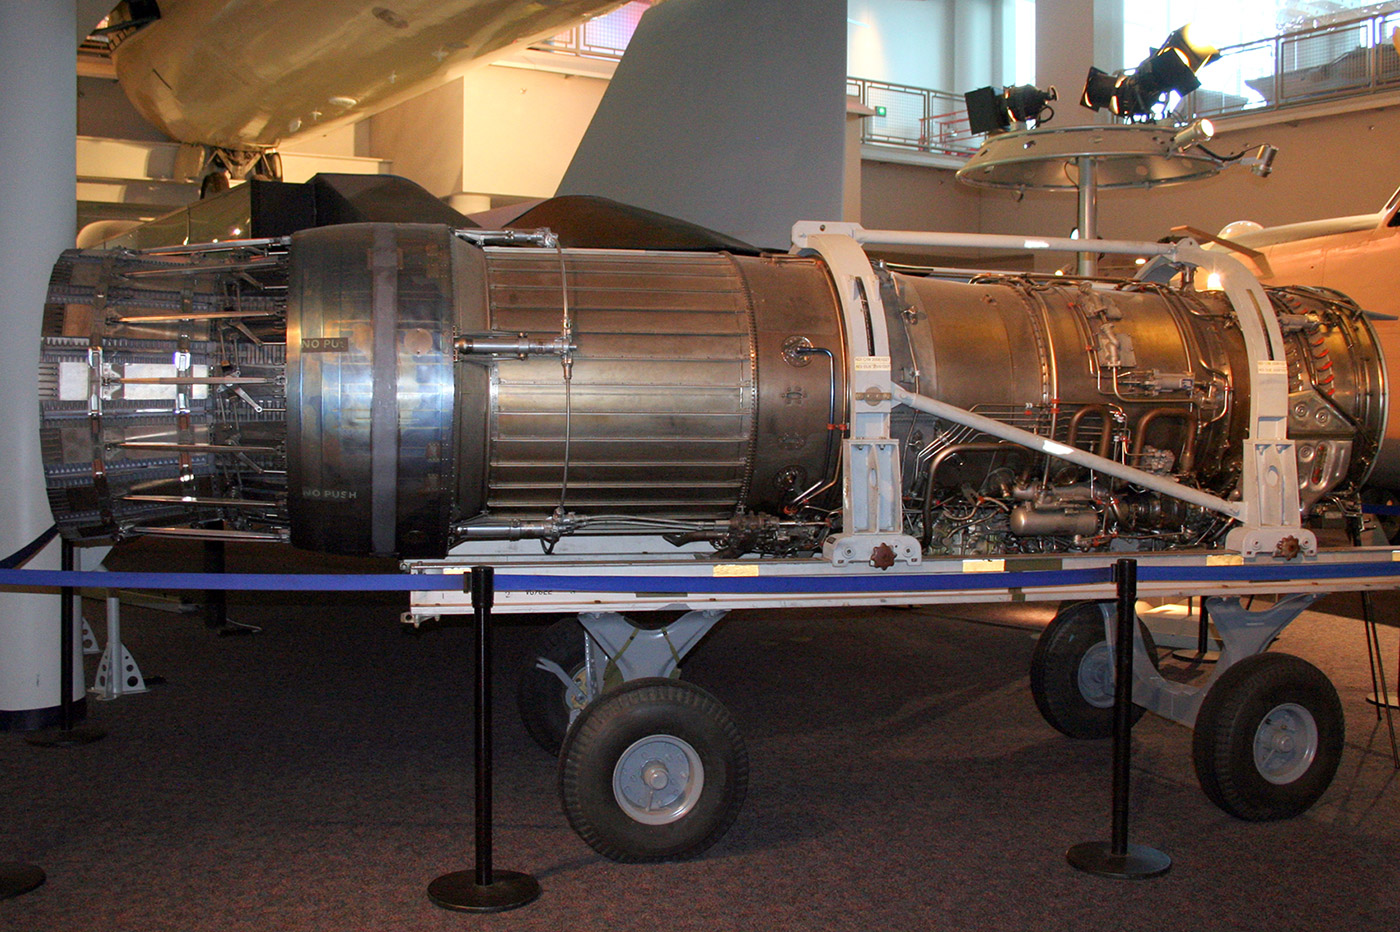 Двухконтурный турбореактивный двигатель Pratt & Whitney F100-100 (F100-PW-100).